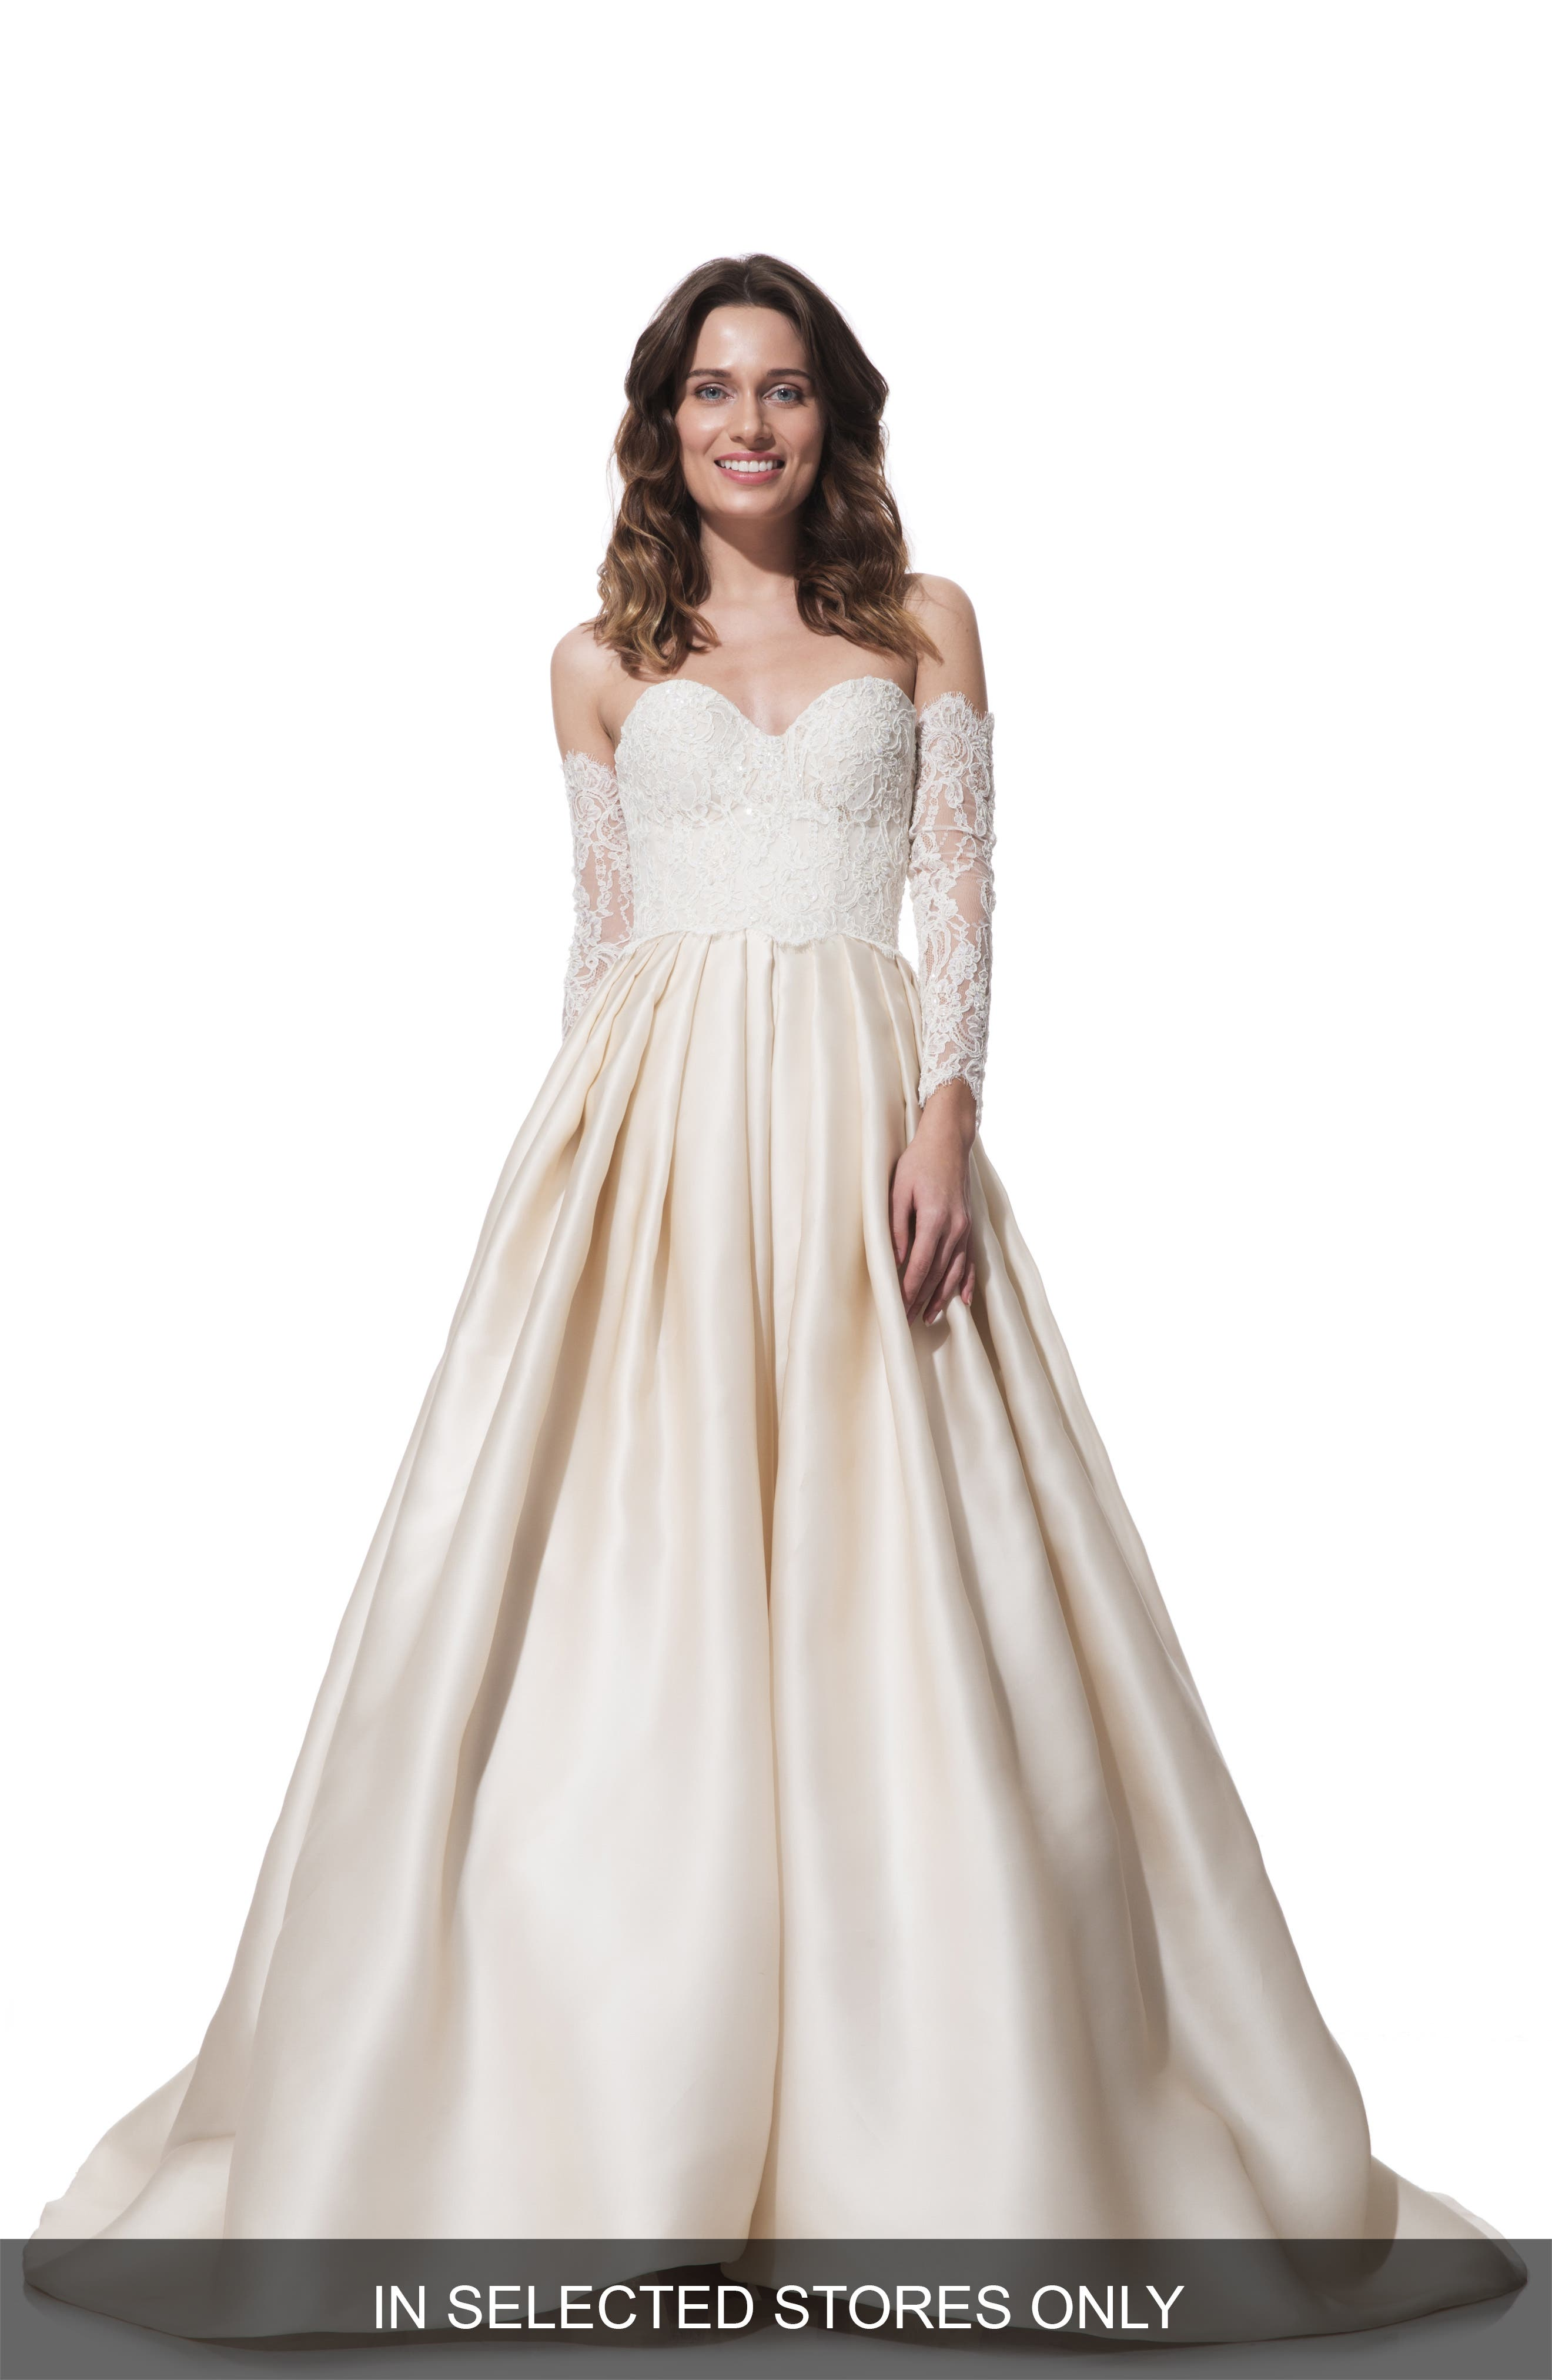 Alternate Image 1 Selected - Olia Zavozina Clara Lace & Silk Organza Ballgown Dress